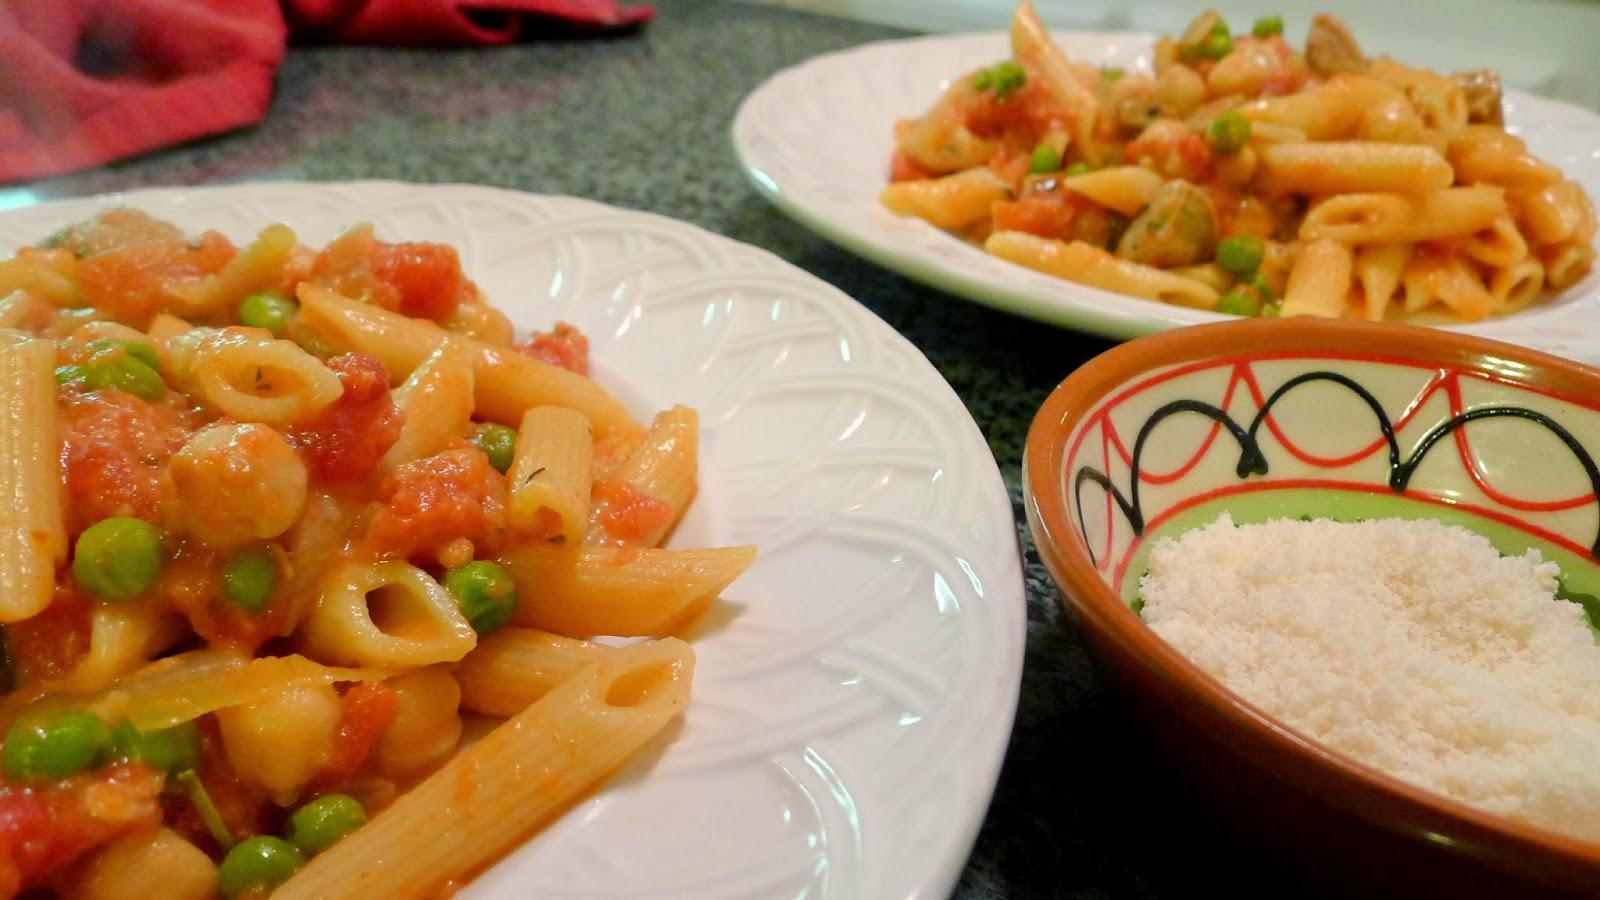 Pasta recipe from pantry staples